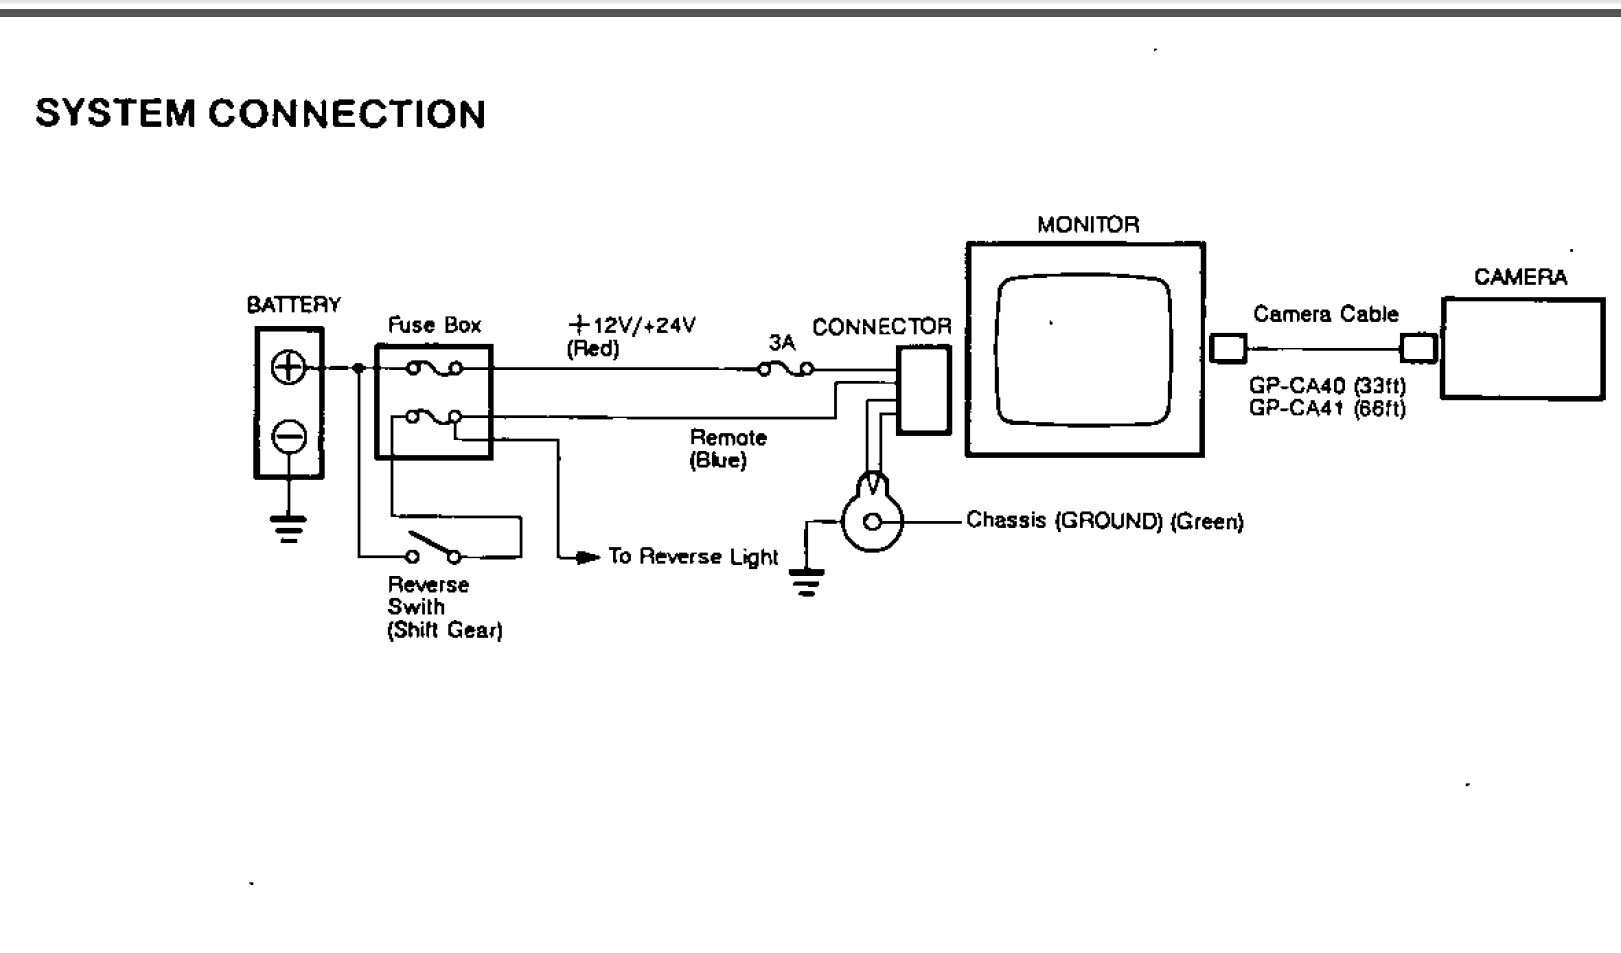 2012-03-14_204109_3-14-2012_4-40-49_pm Weldex Rv Camera Wiring Diagram on speco wiring diagram, inovonics wiring diagram, panasonic wiring diagram, jvc wiring diagram, von duprin wiring diagram, schlage wiring diagram, toshiba wiring diagram, everfocus wiring diagram, bogen wiring diagram, samsung wiring diagram, honeywell wiring diagram, benq wiring diagram, marshall wiring diagram, pyle wiring diagram, apc wiring diagram, atv wiring diagram, bosch wiring diagram, audiovox wiring diagram, hid wiring diagram, rca wiring diagram,